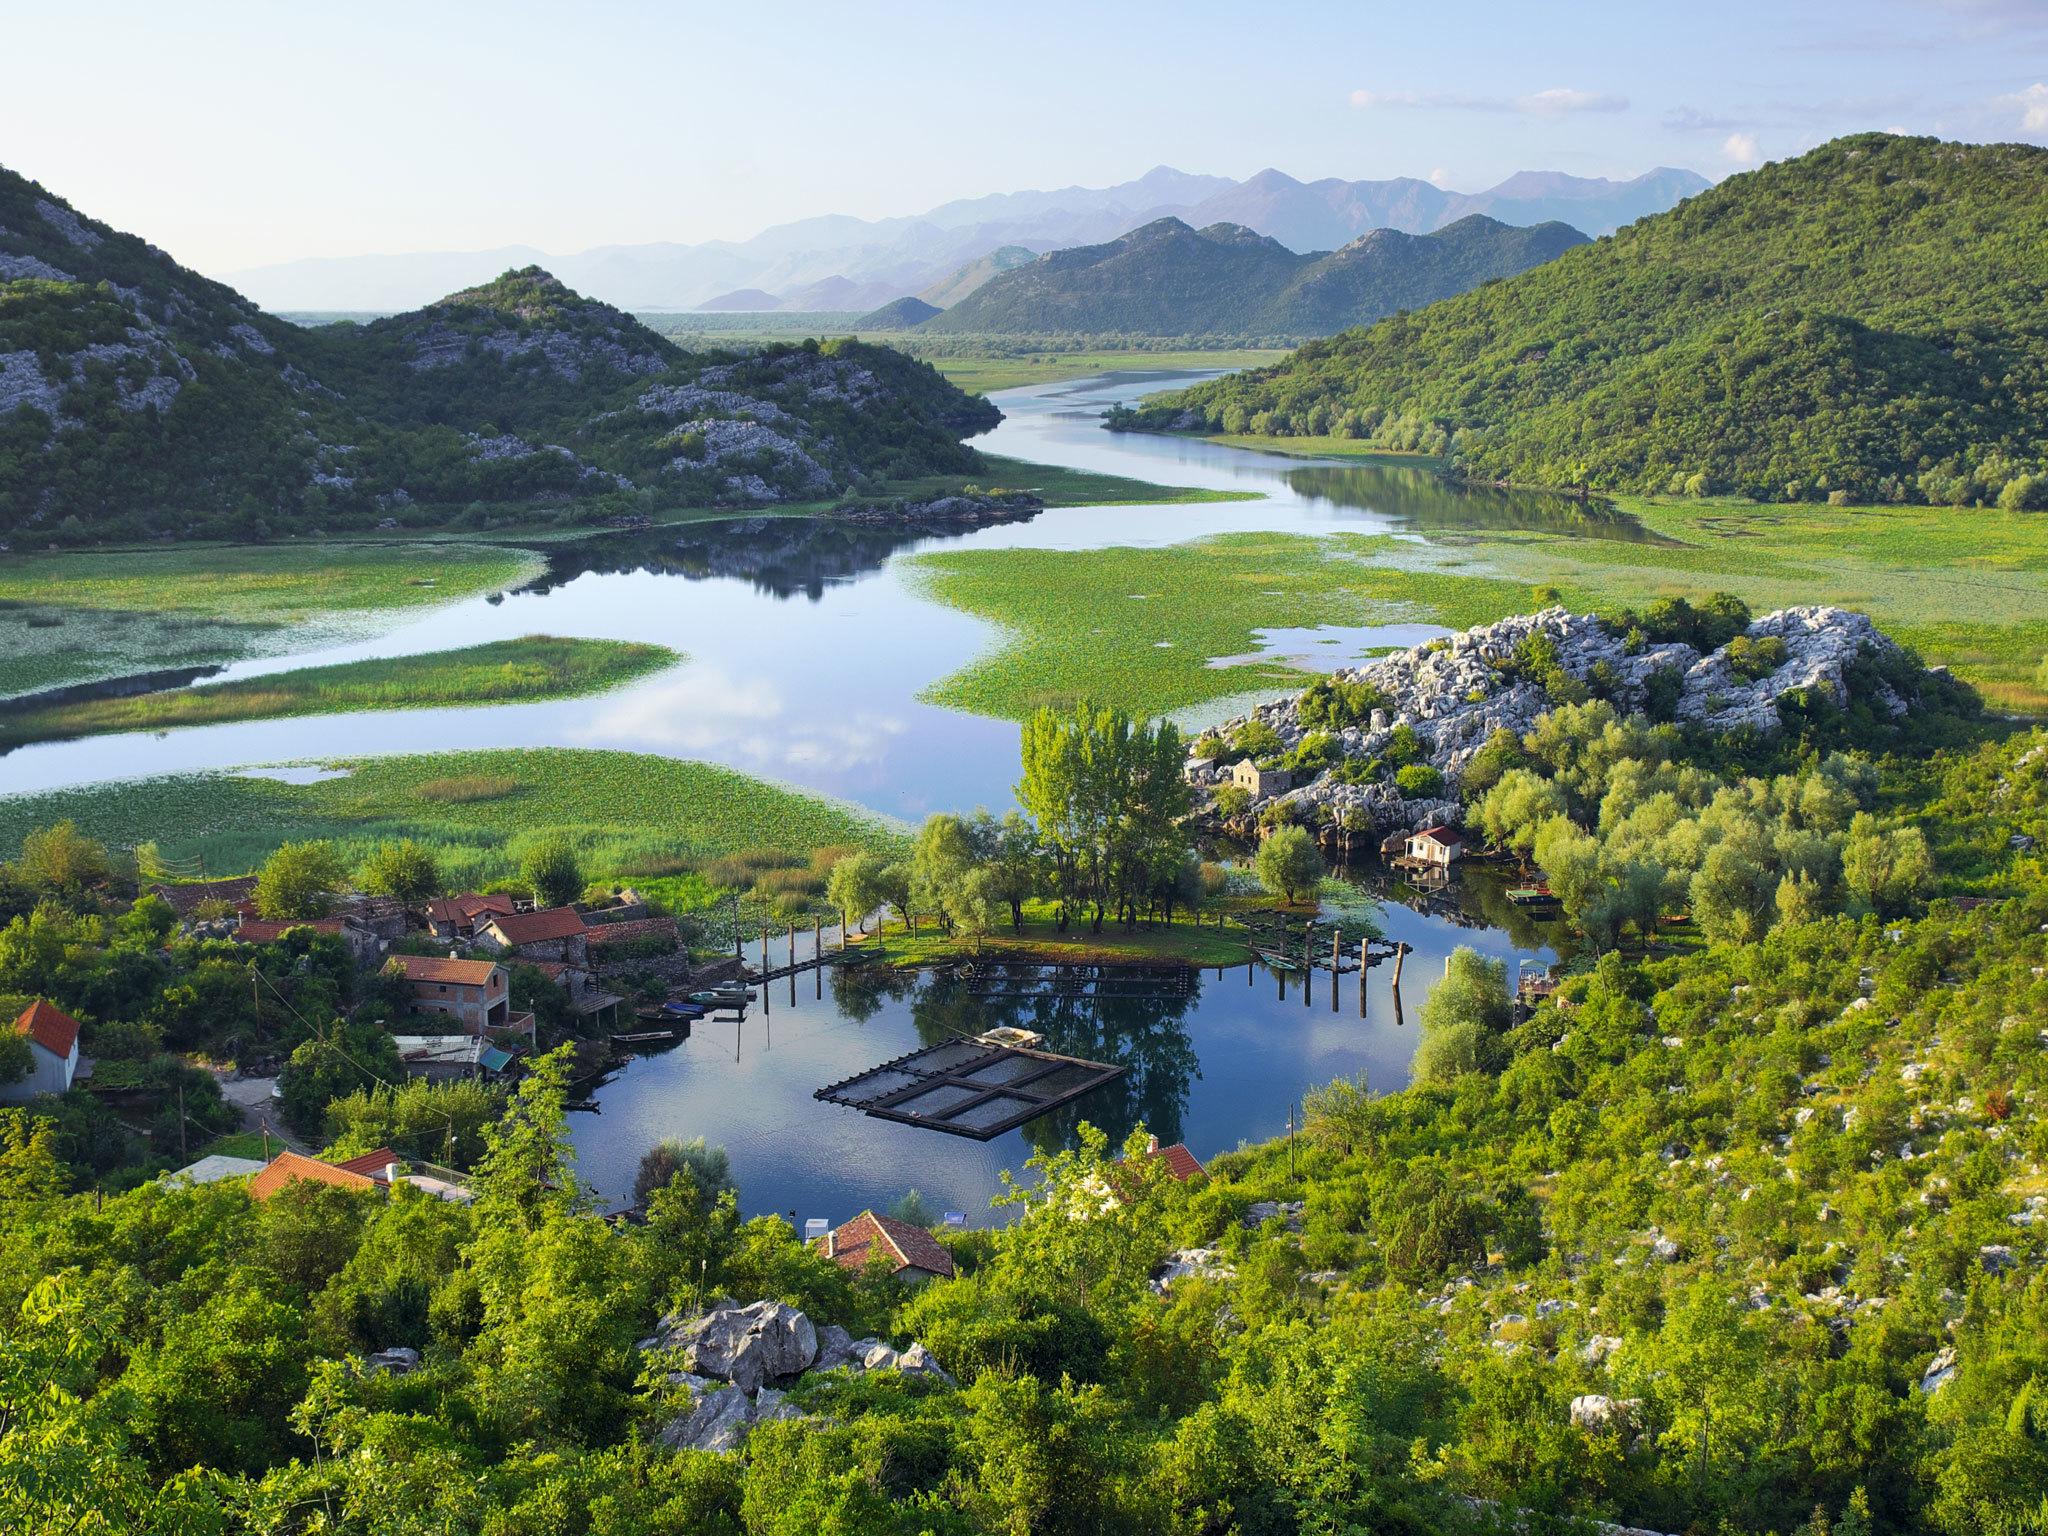 Lake Skadar national park in Southern Montenegro